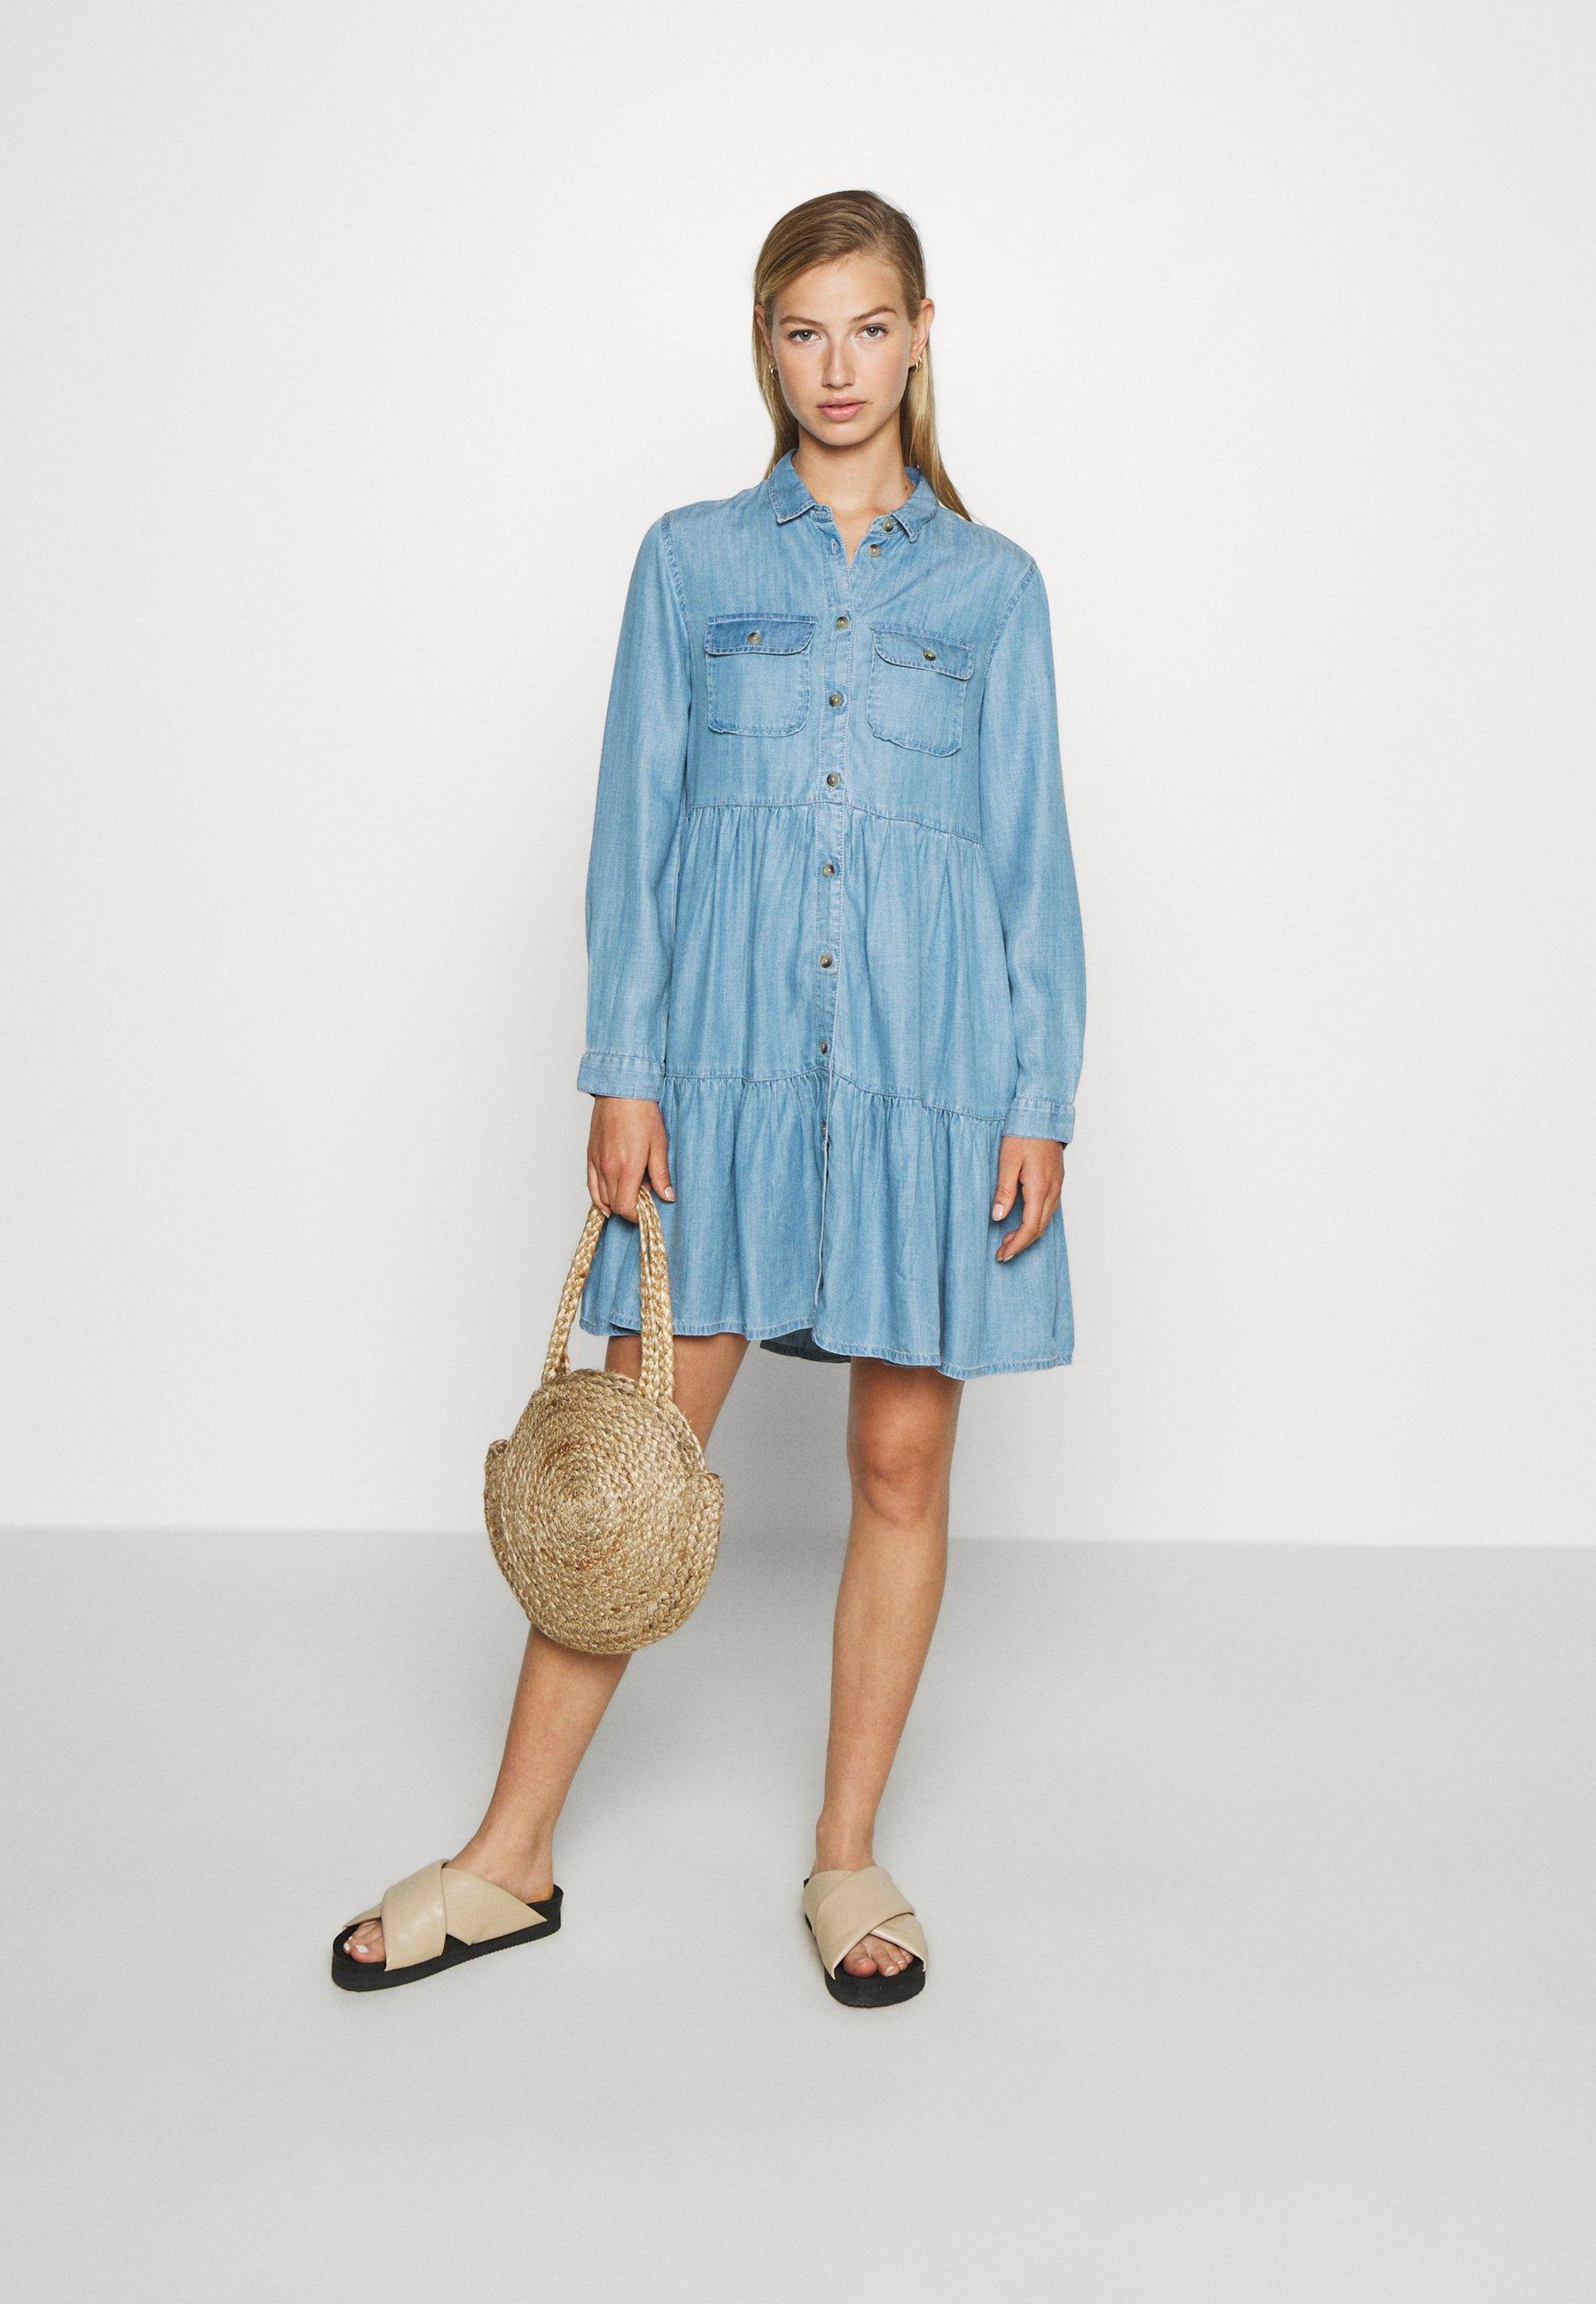 Superdry Tiered Dress - Dongerikjole Light Indigo Used/blå Denim